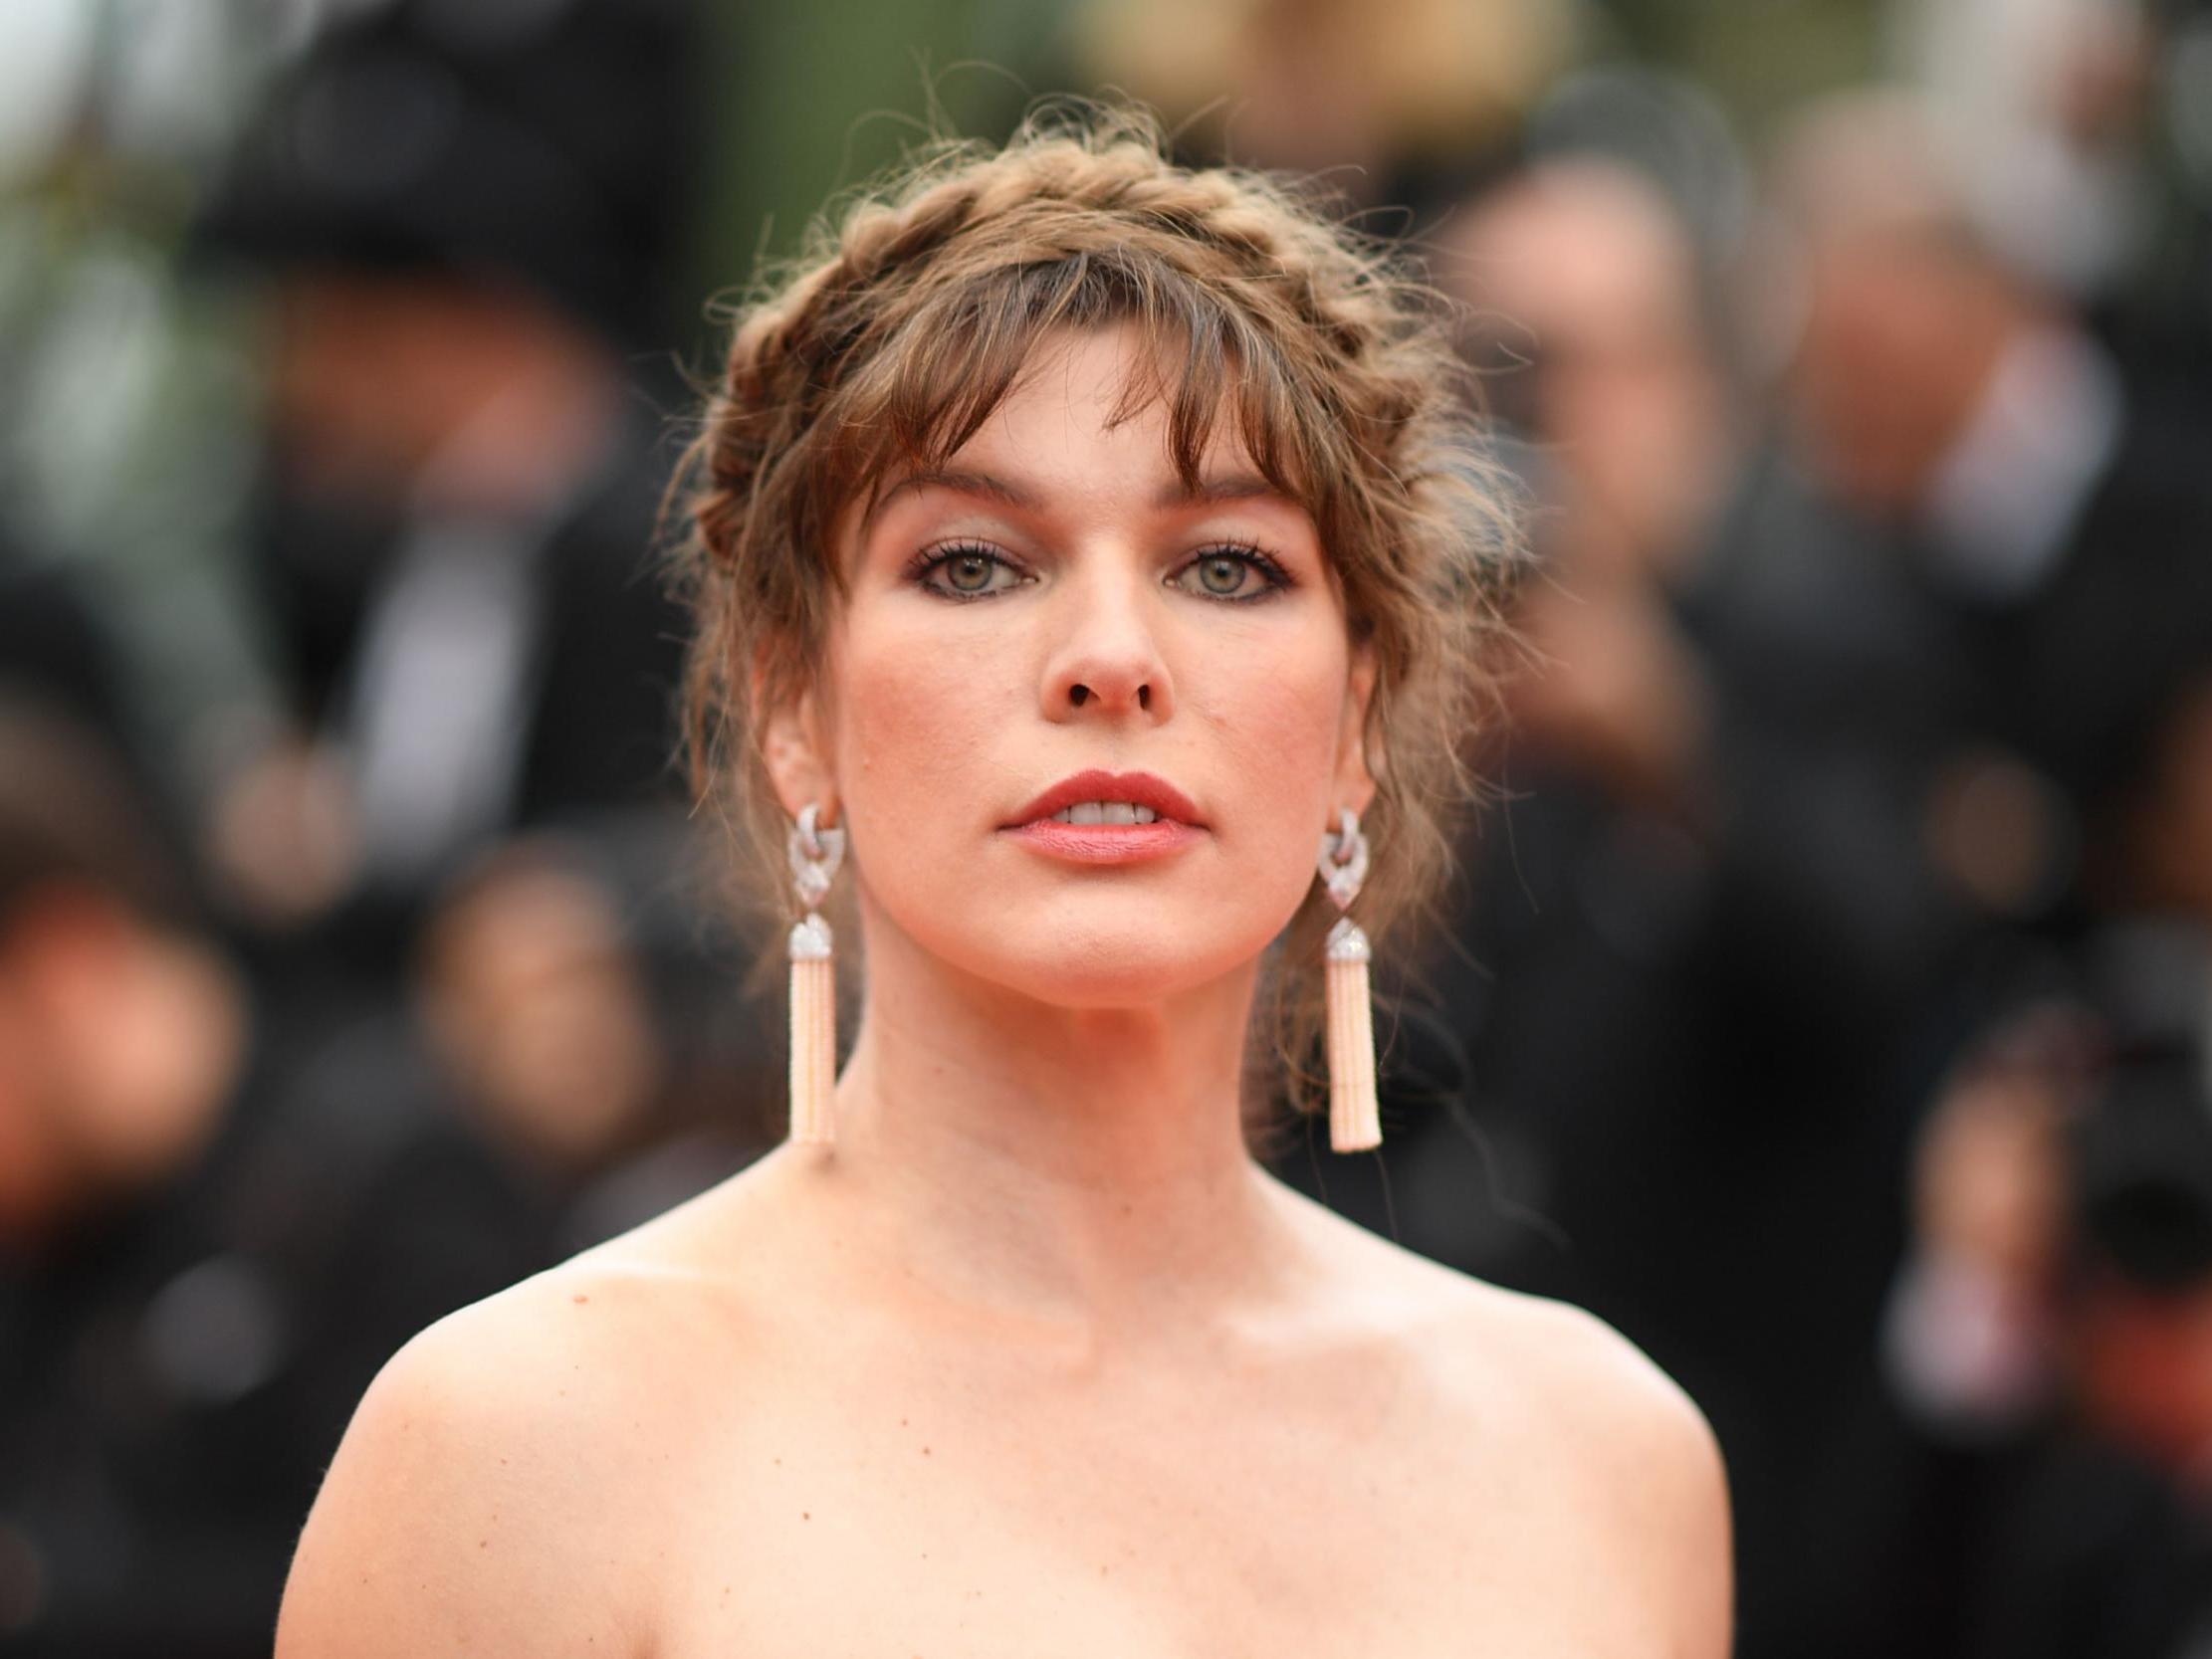 Milla Jovovich announces third pregnancy after 'horrific' abortion